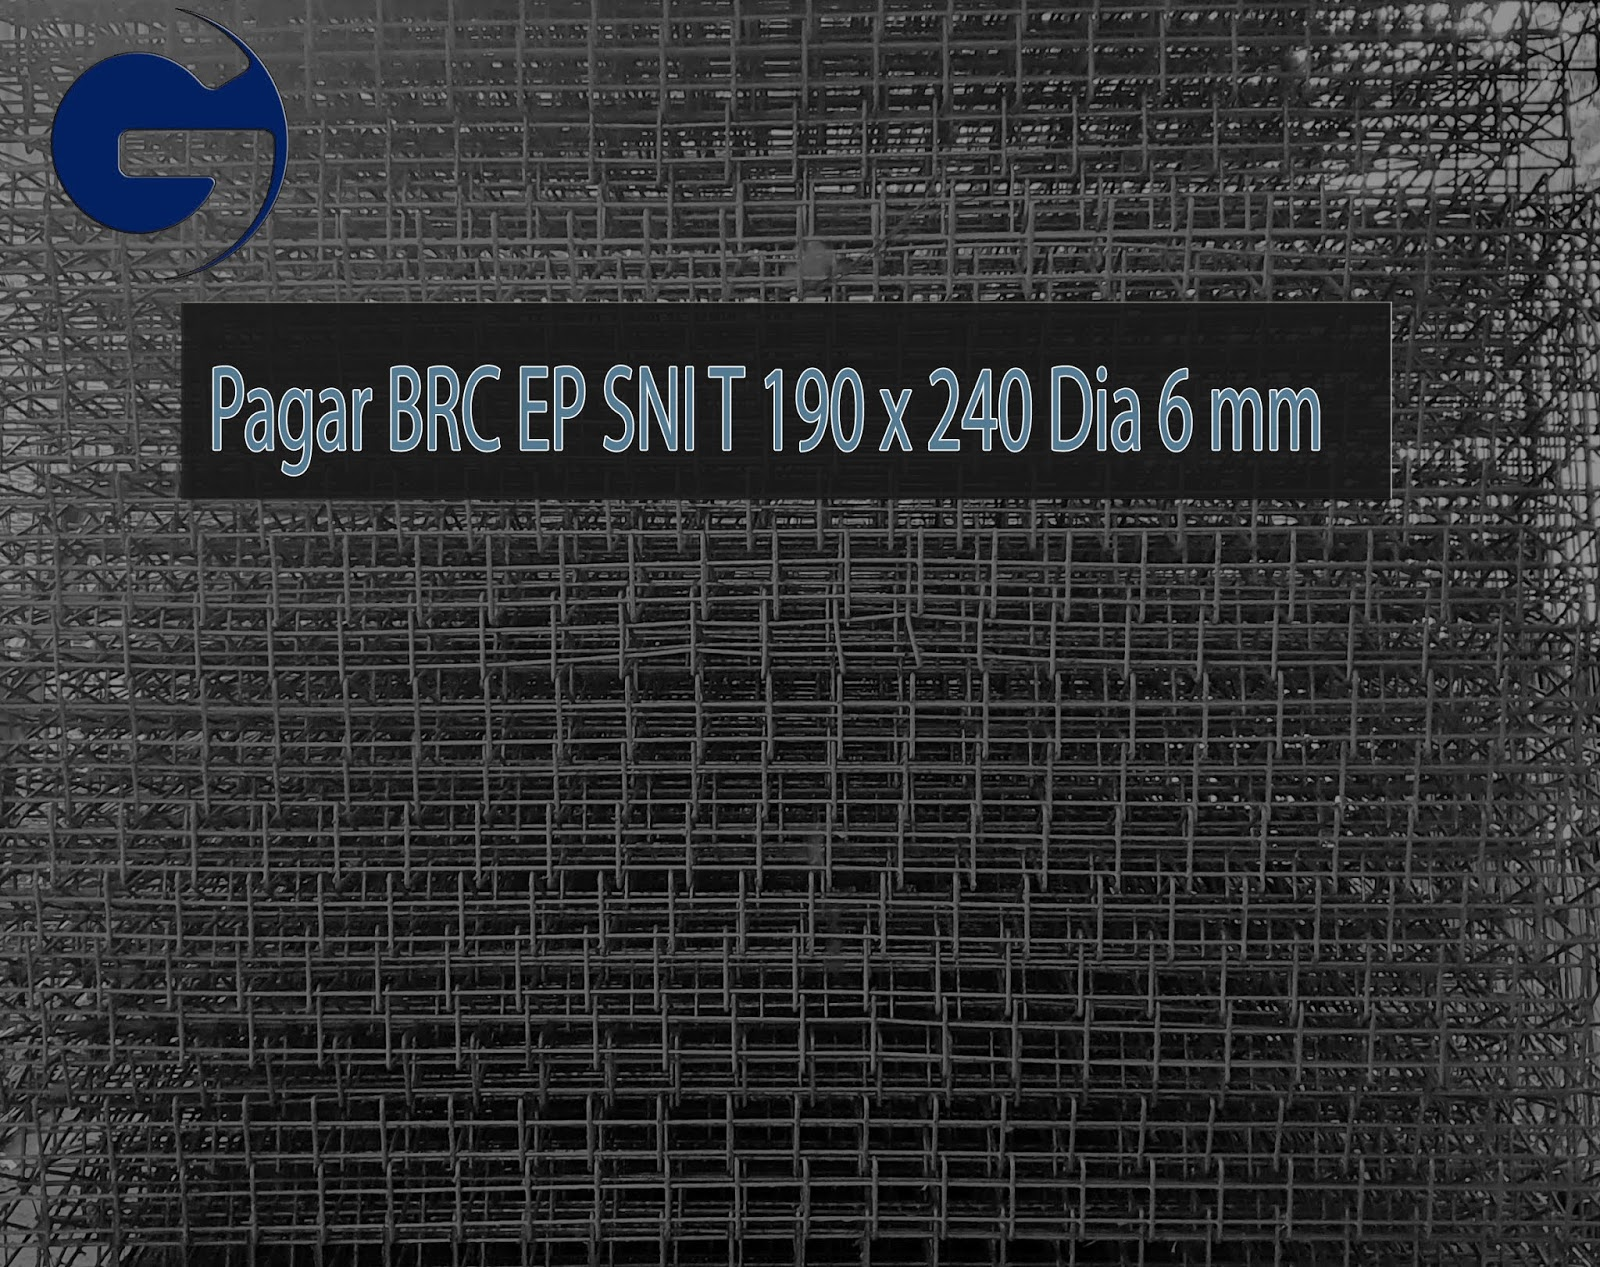 Jual Pagar BRC EP SNI T 190 x 240 Dia 6 mm